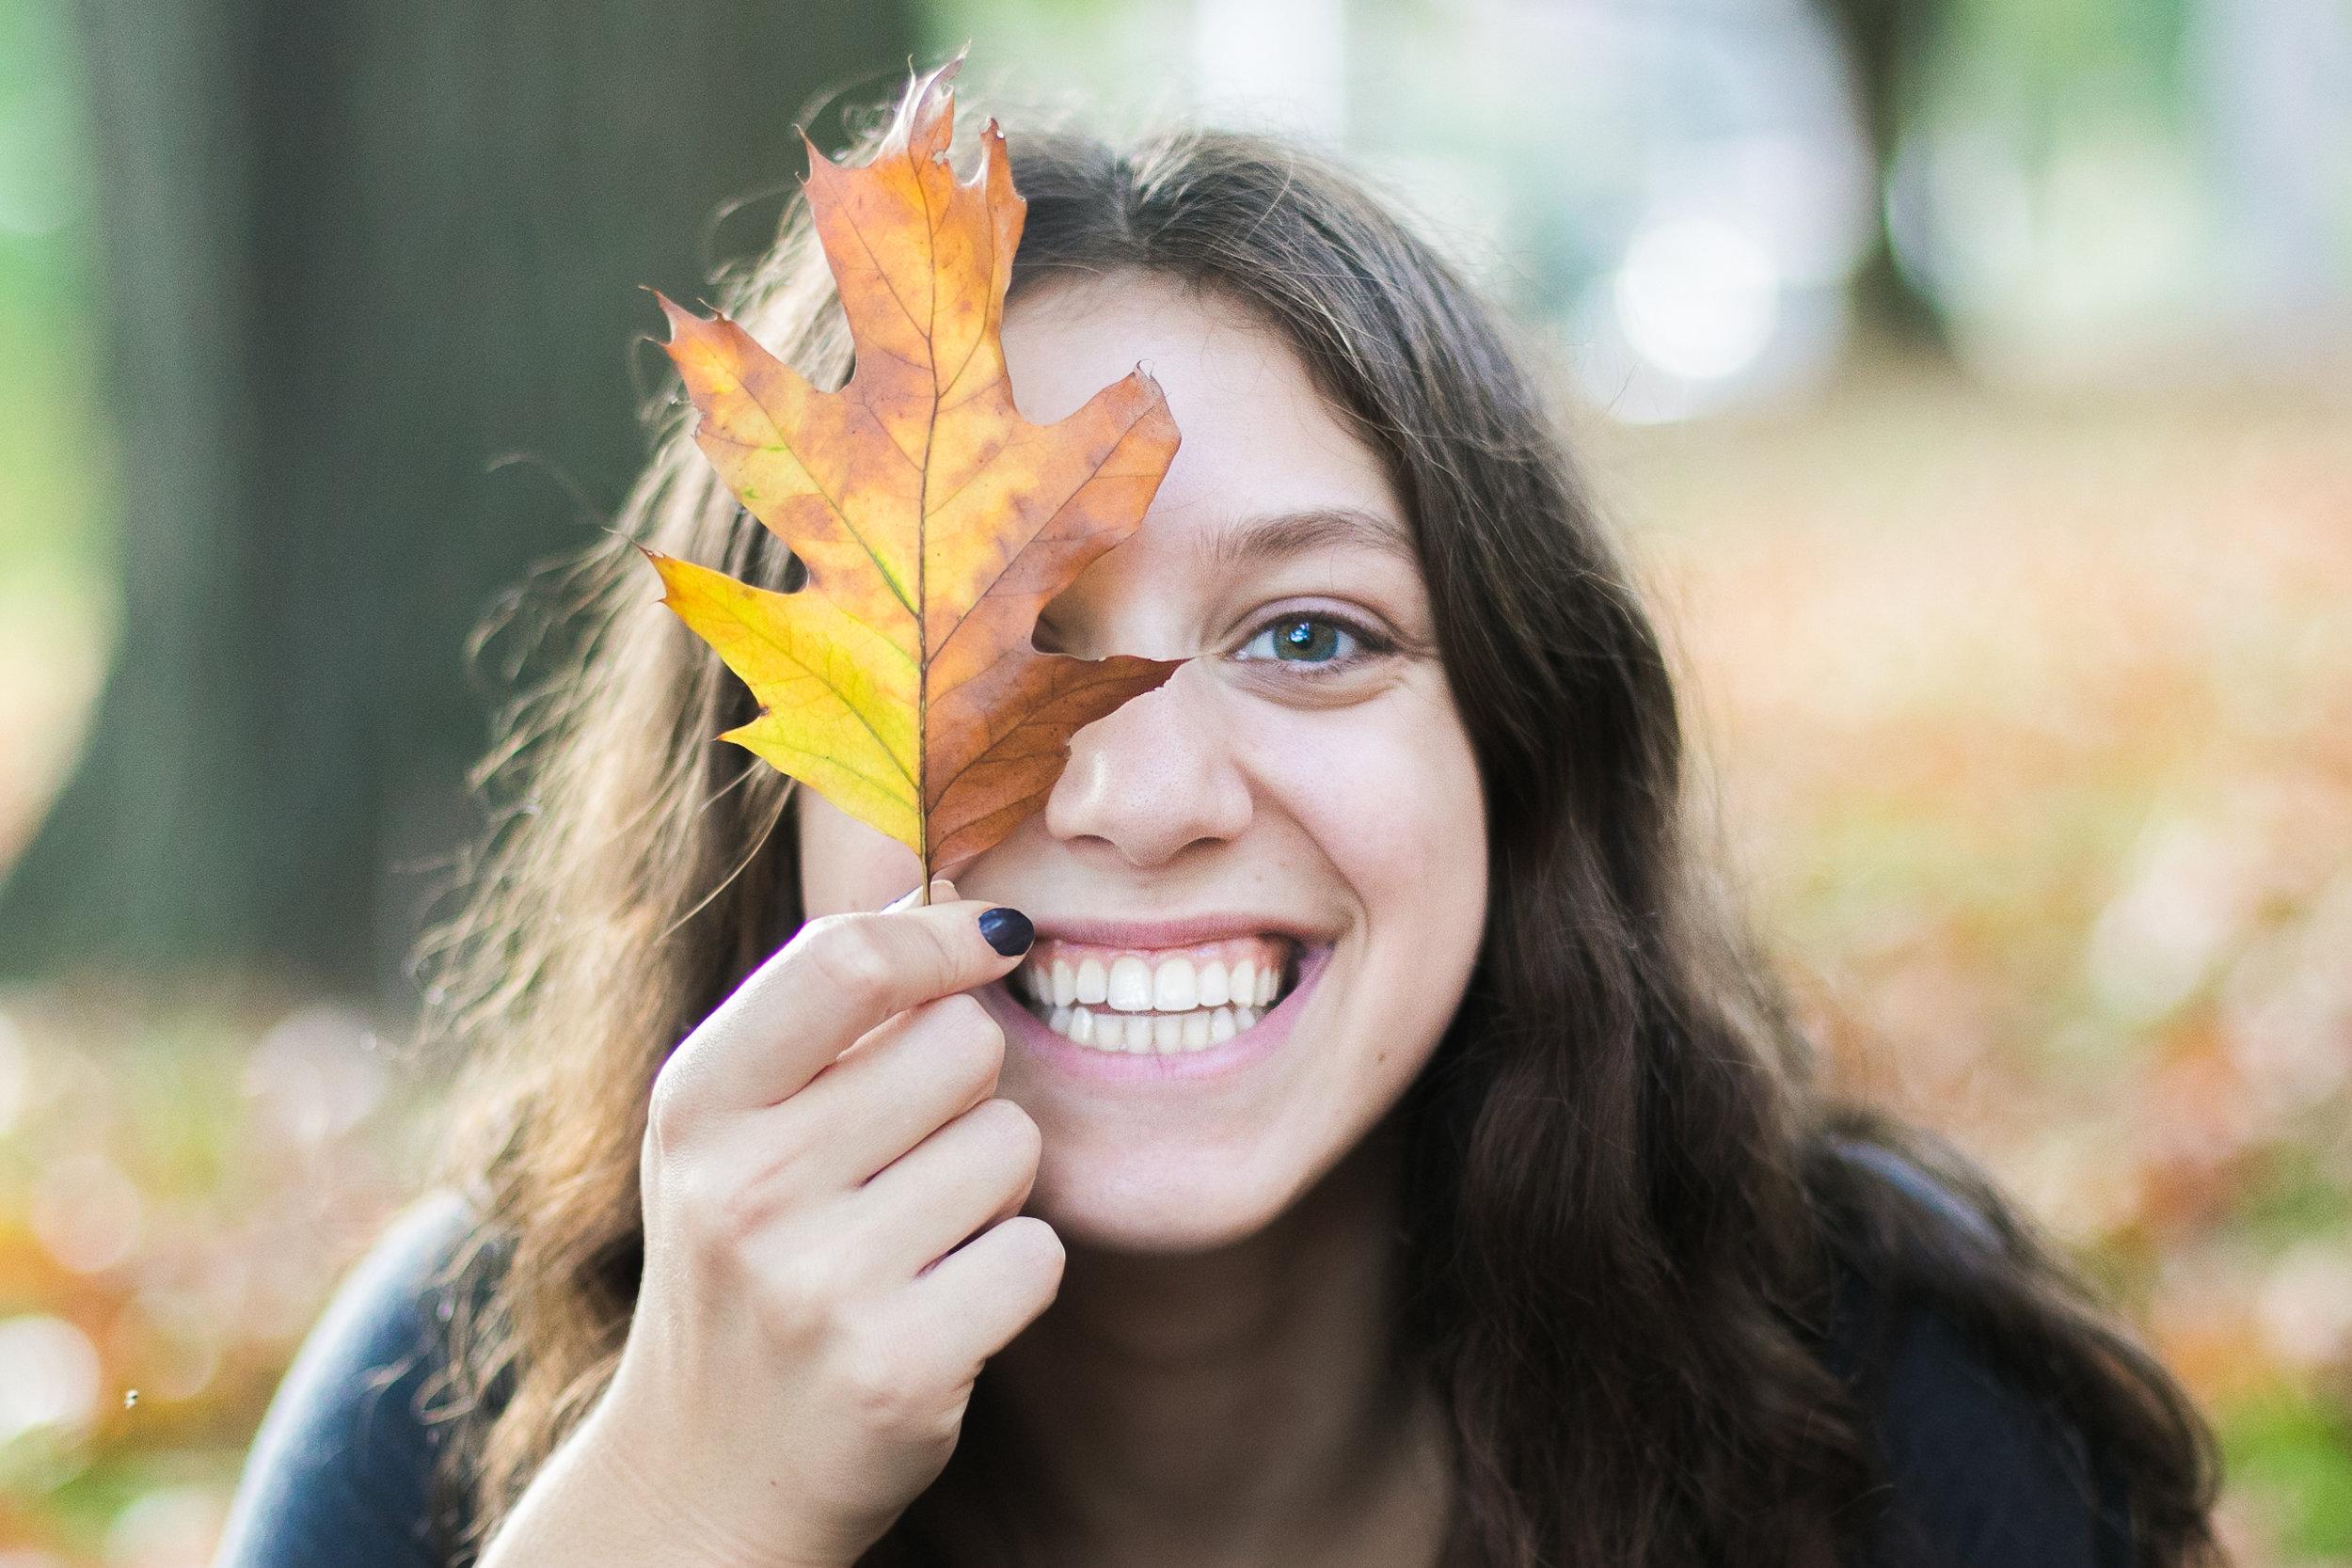 Senior Festive Fall Portrait